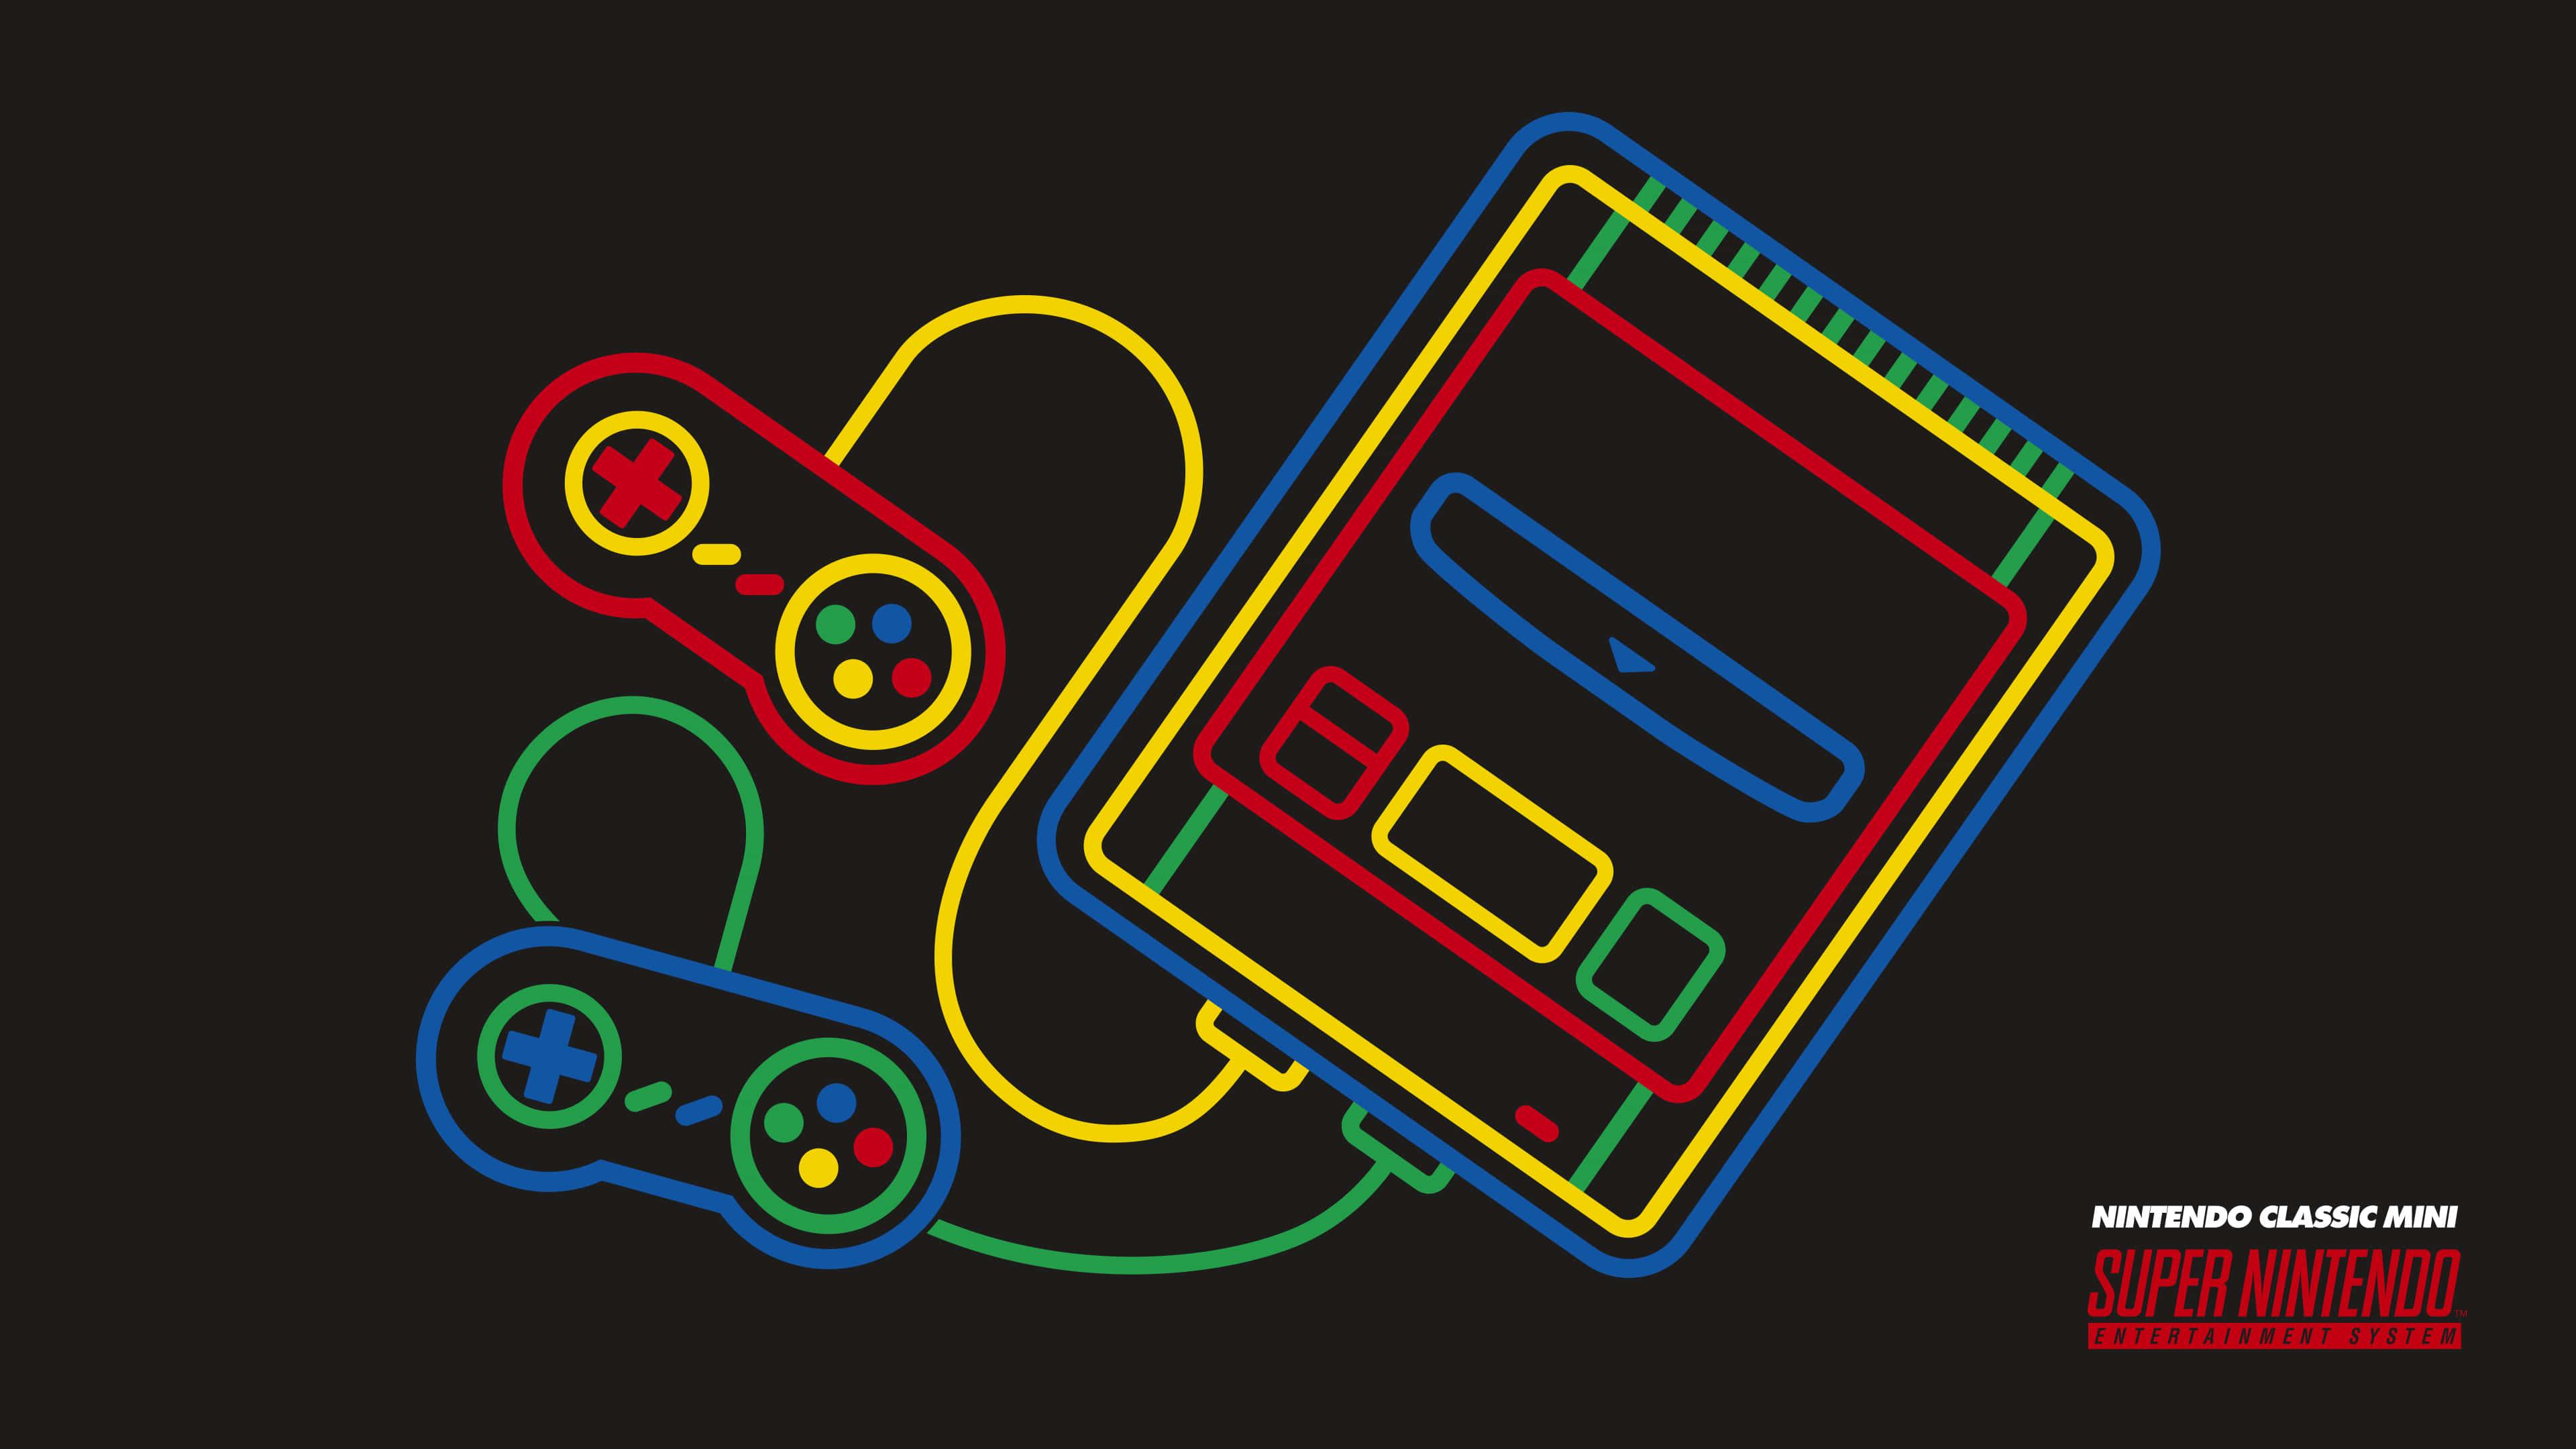 Nintendo Classic Mini Uhd 4k Wallpaper Pixelz